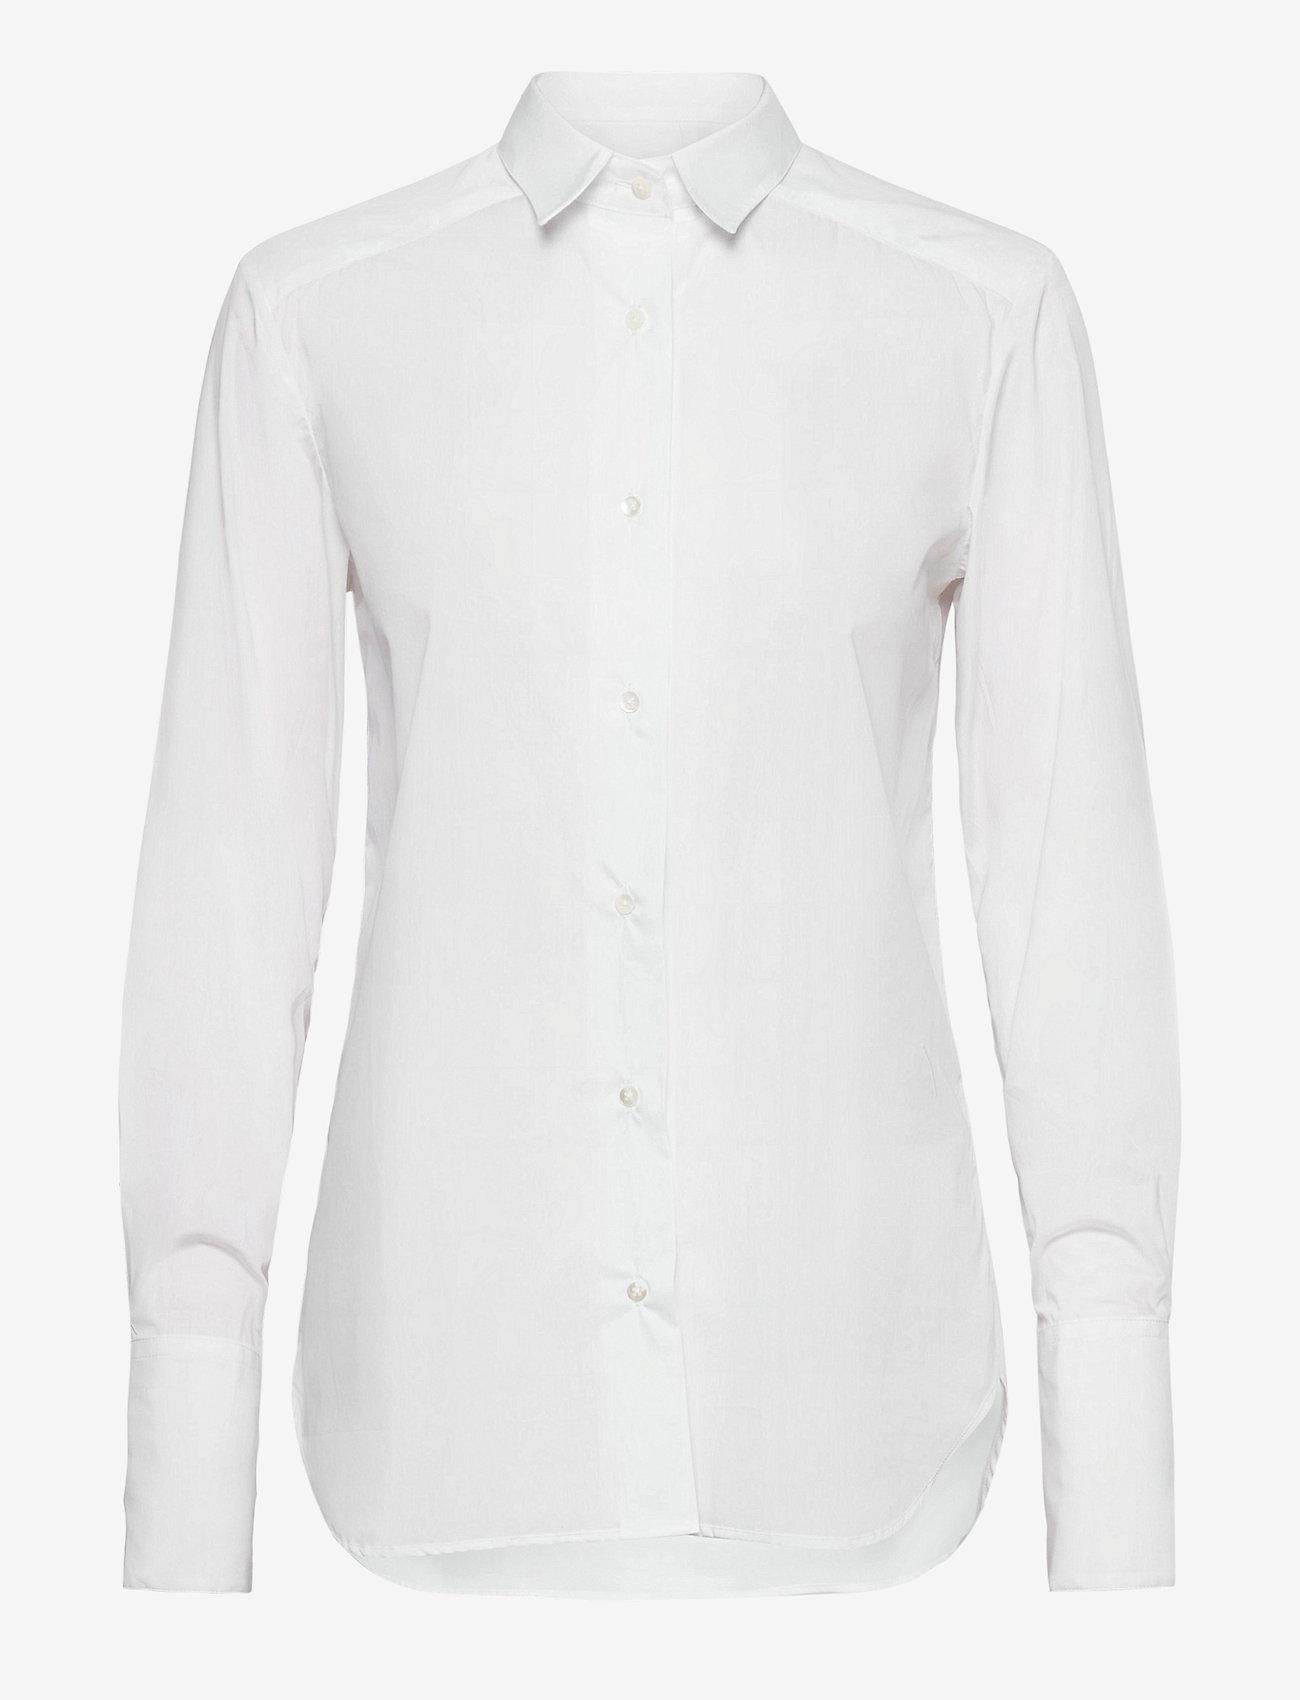 Britt Sisseck - Bianca shirt - chemises à manches longues - white - 1